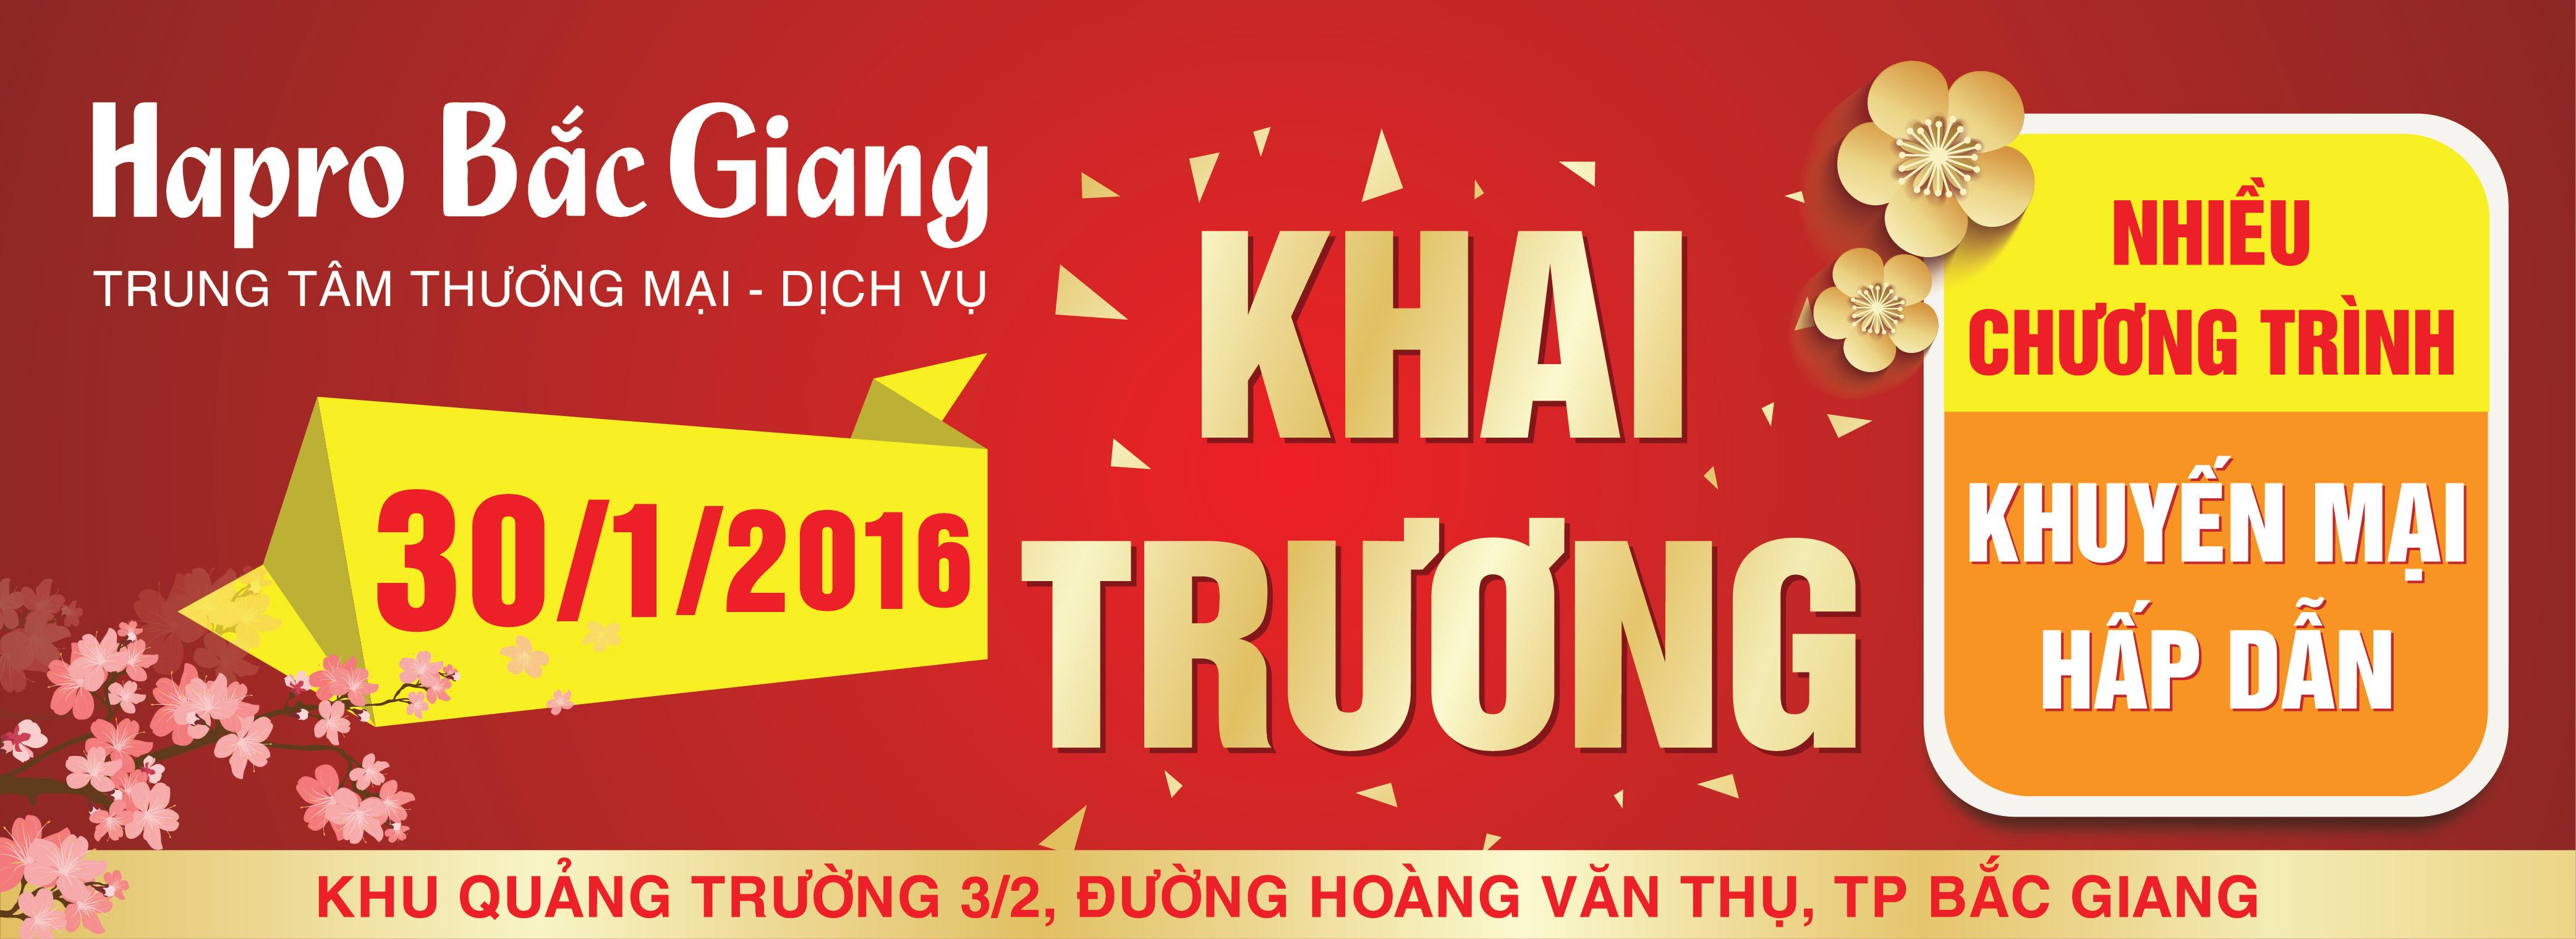 banner-Bắc-Giang-05